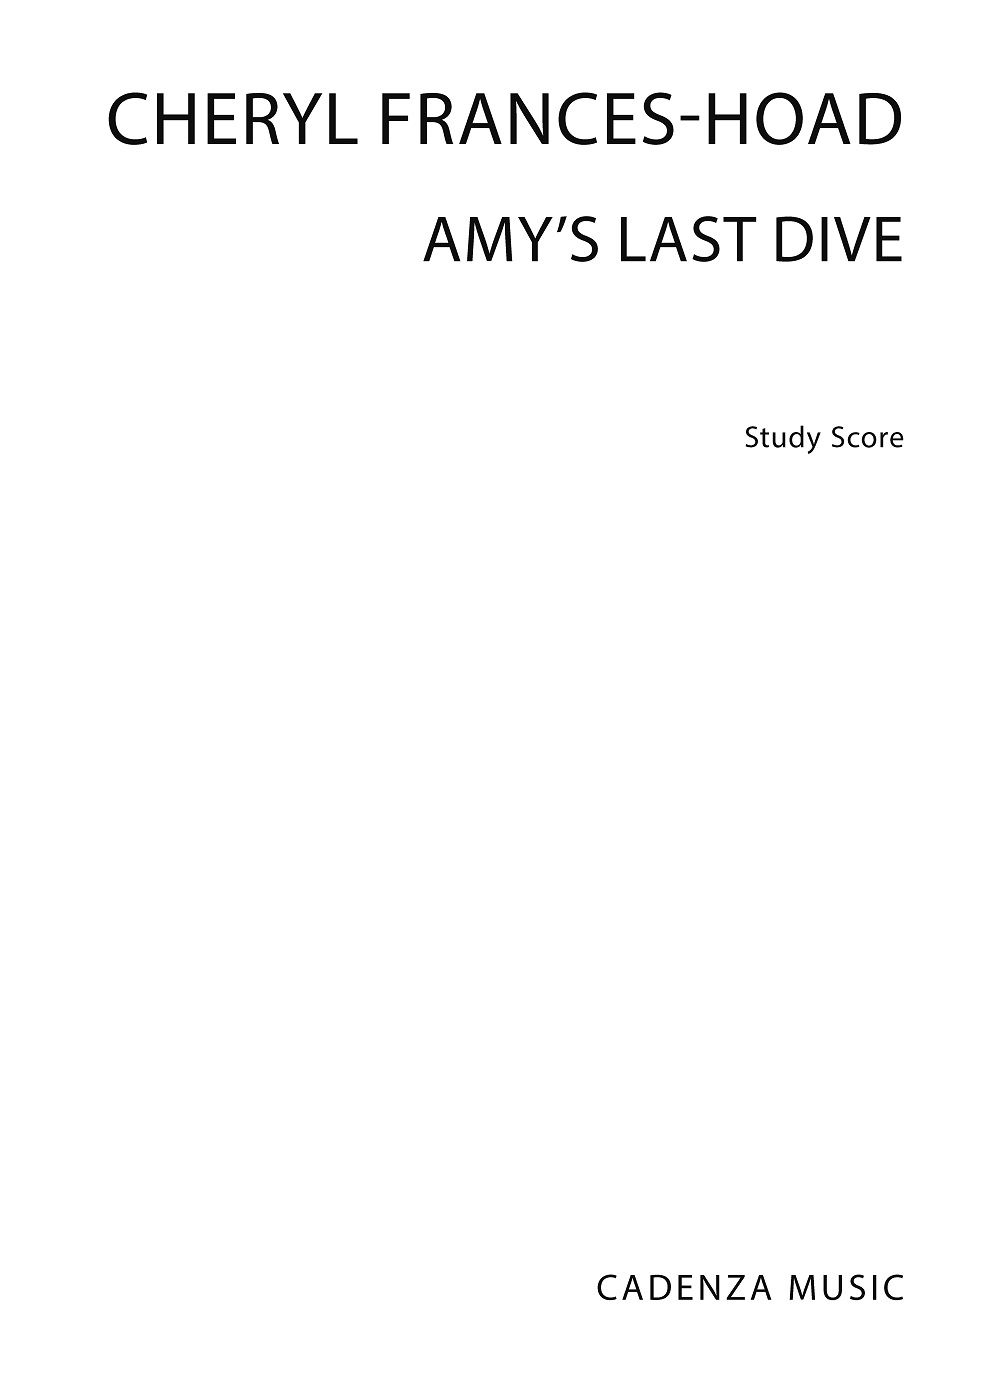 Cheryl Frances-Hoad: Amy